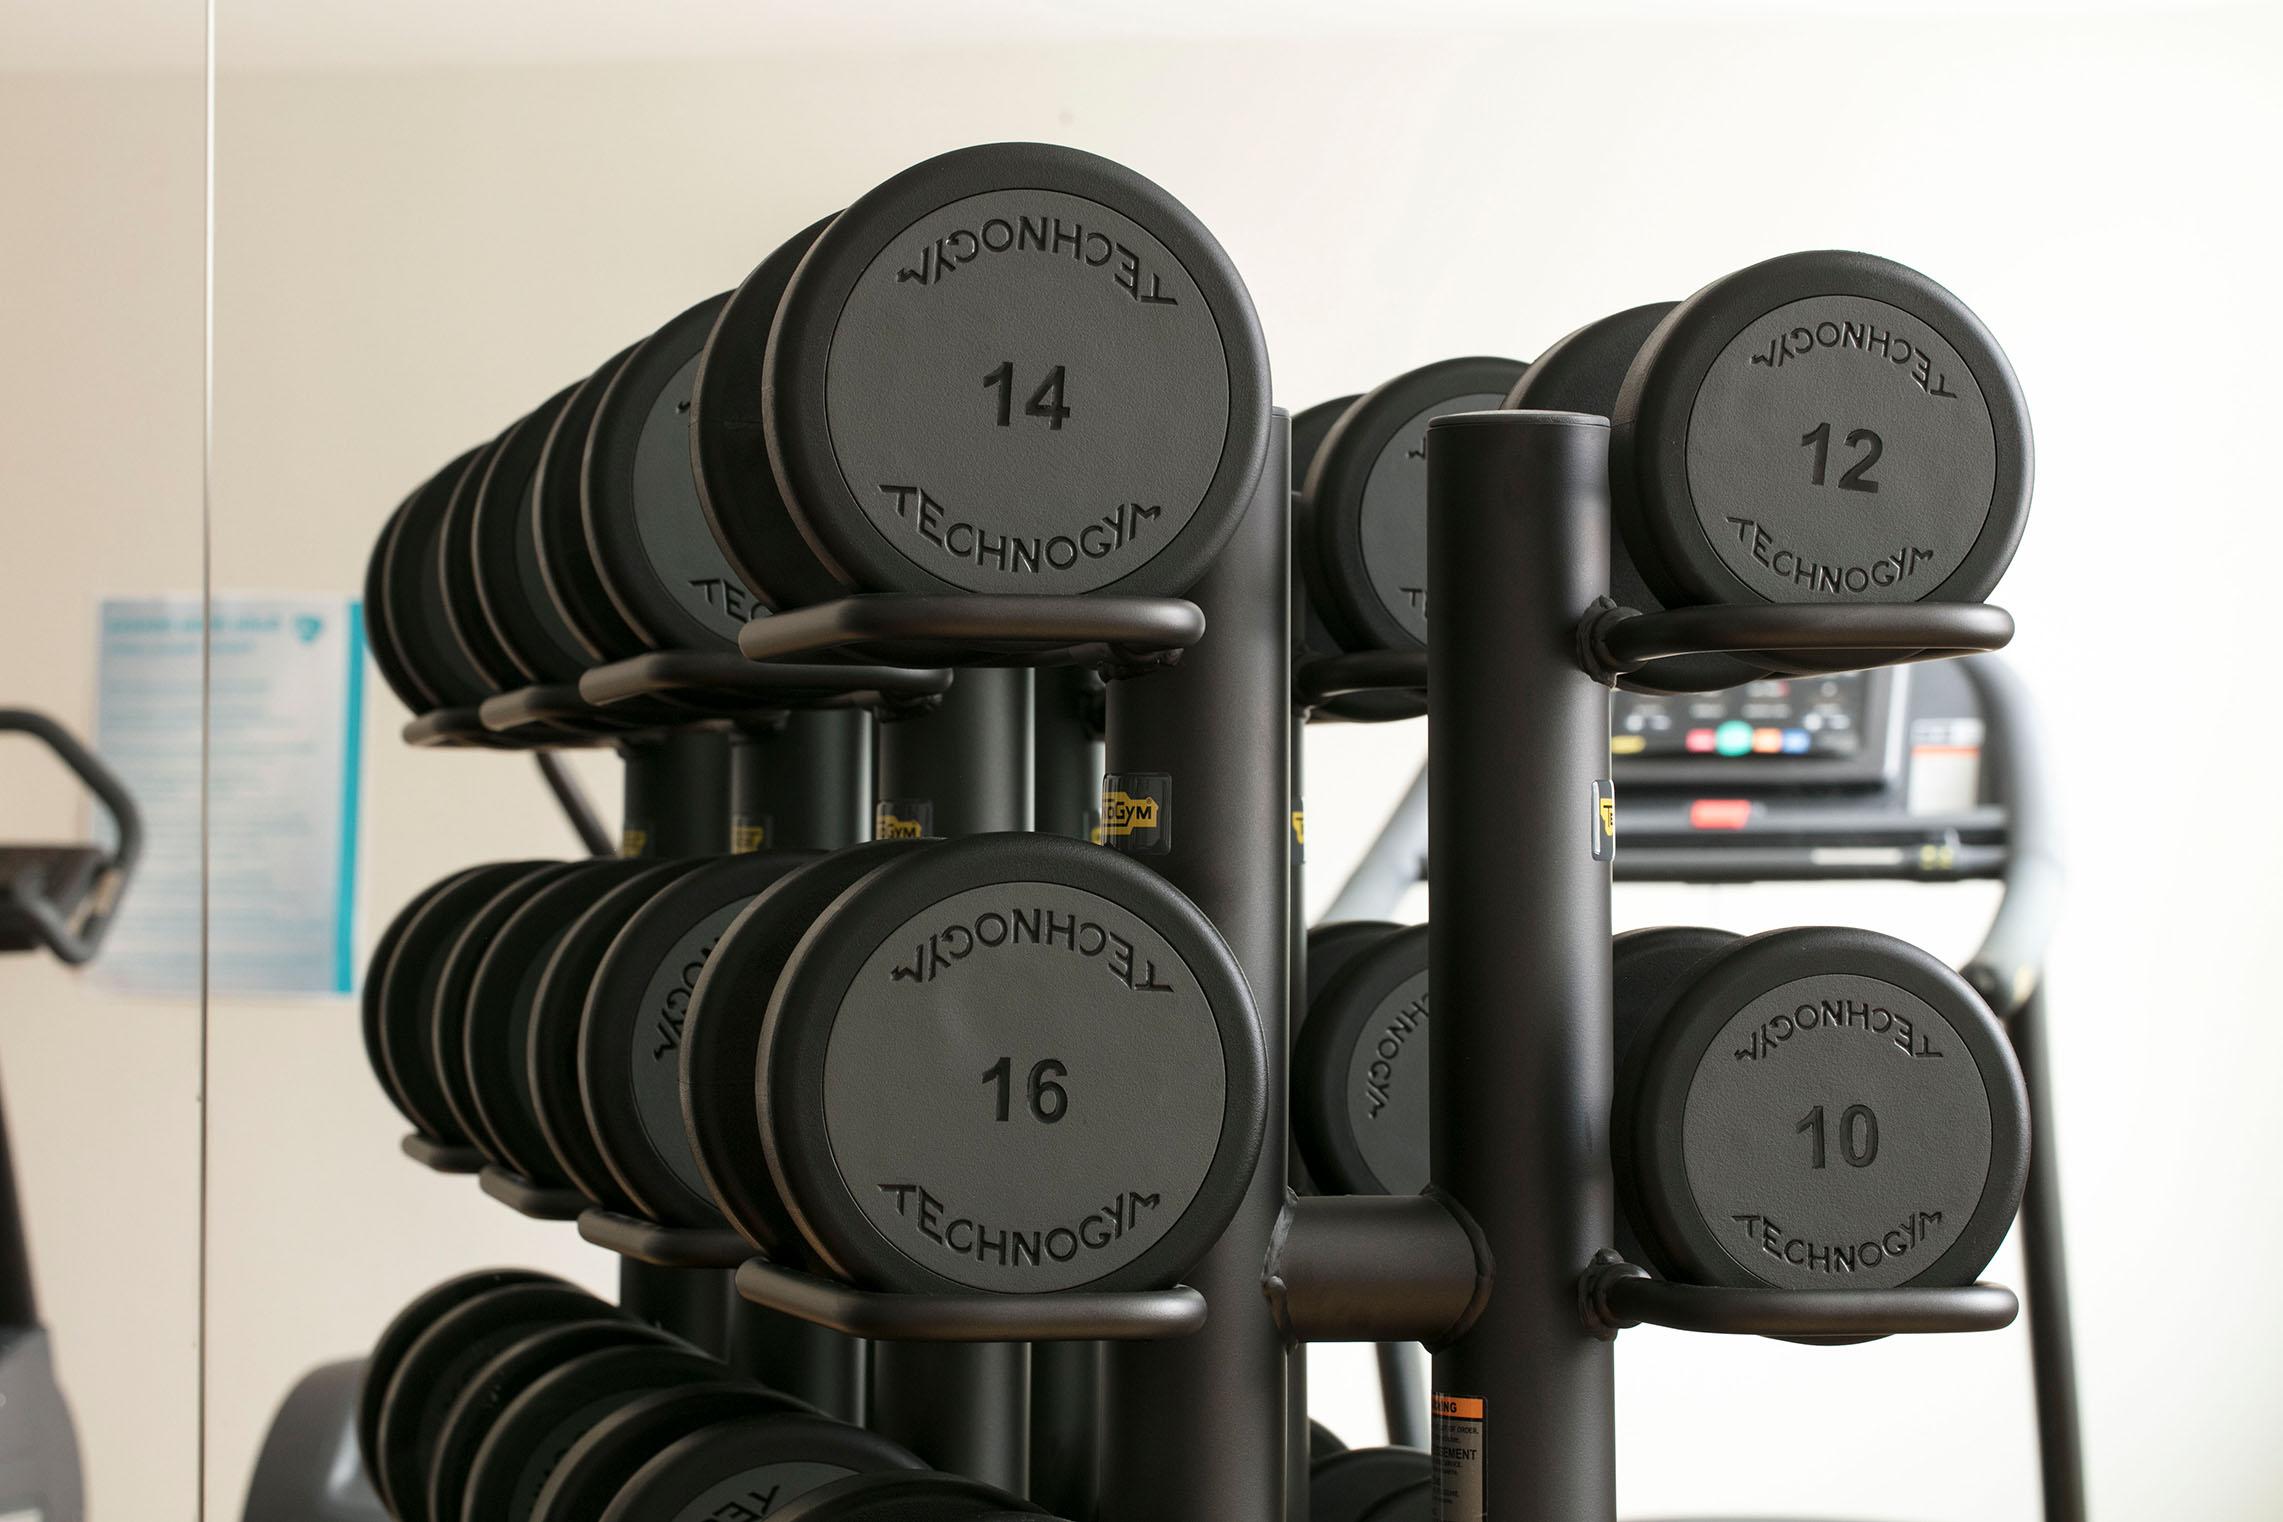 hampton-by-hilton-paris-clichy-salle-de-fitness-halteres-1